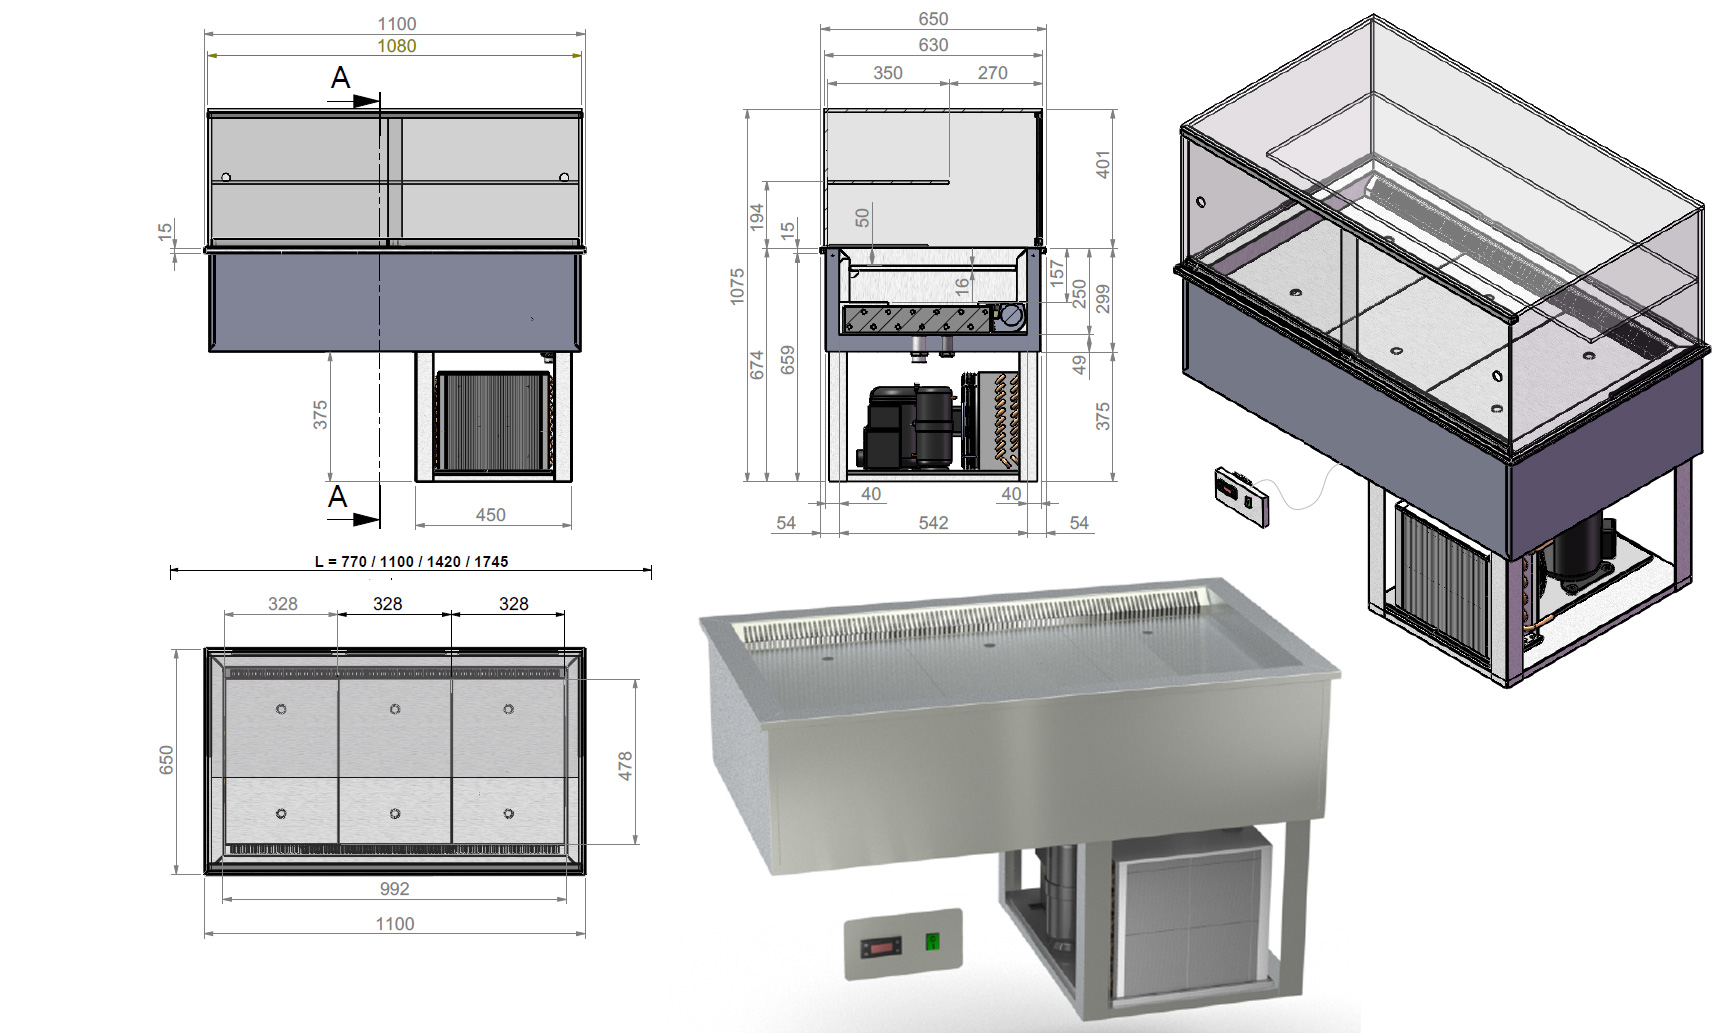 vitrine r frig r e encastrable sur mesure comptoir. Black Bedroom Furniture Sets. Home Design Ideas